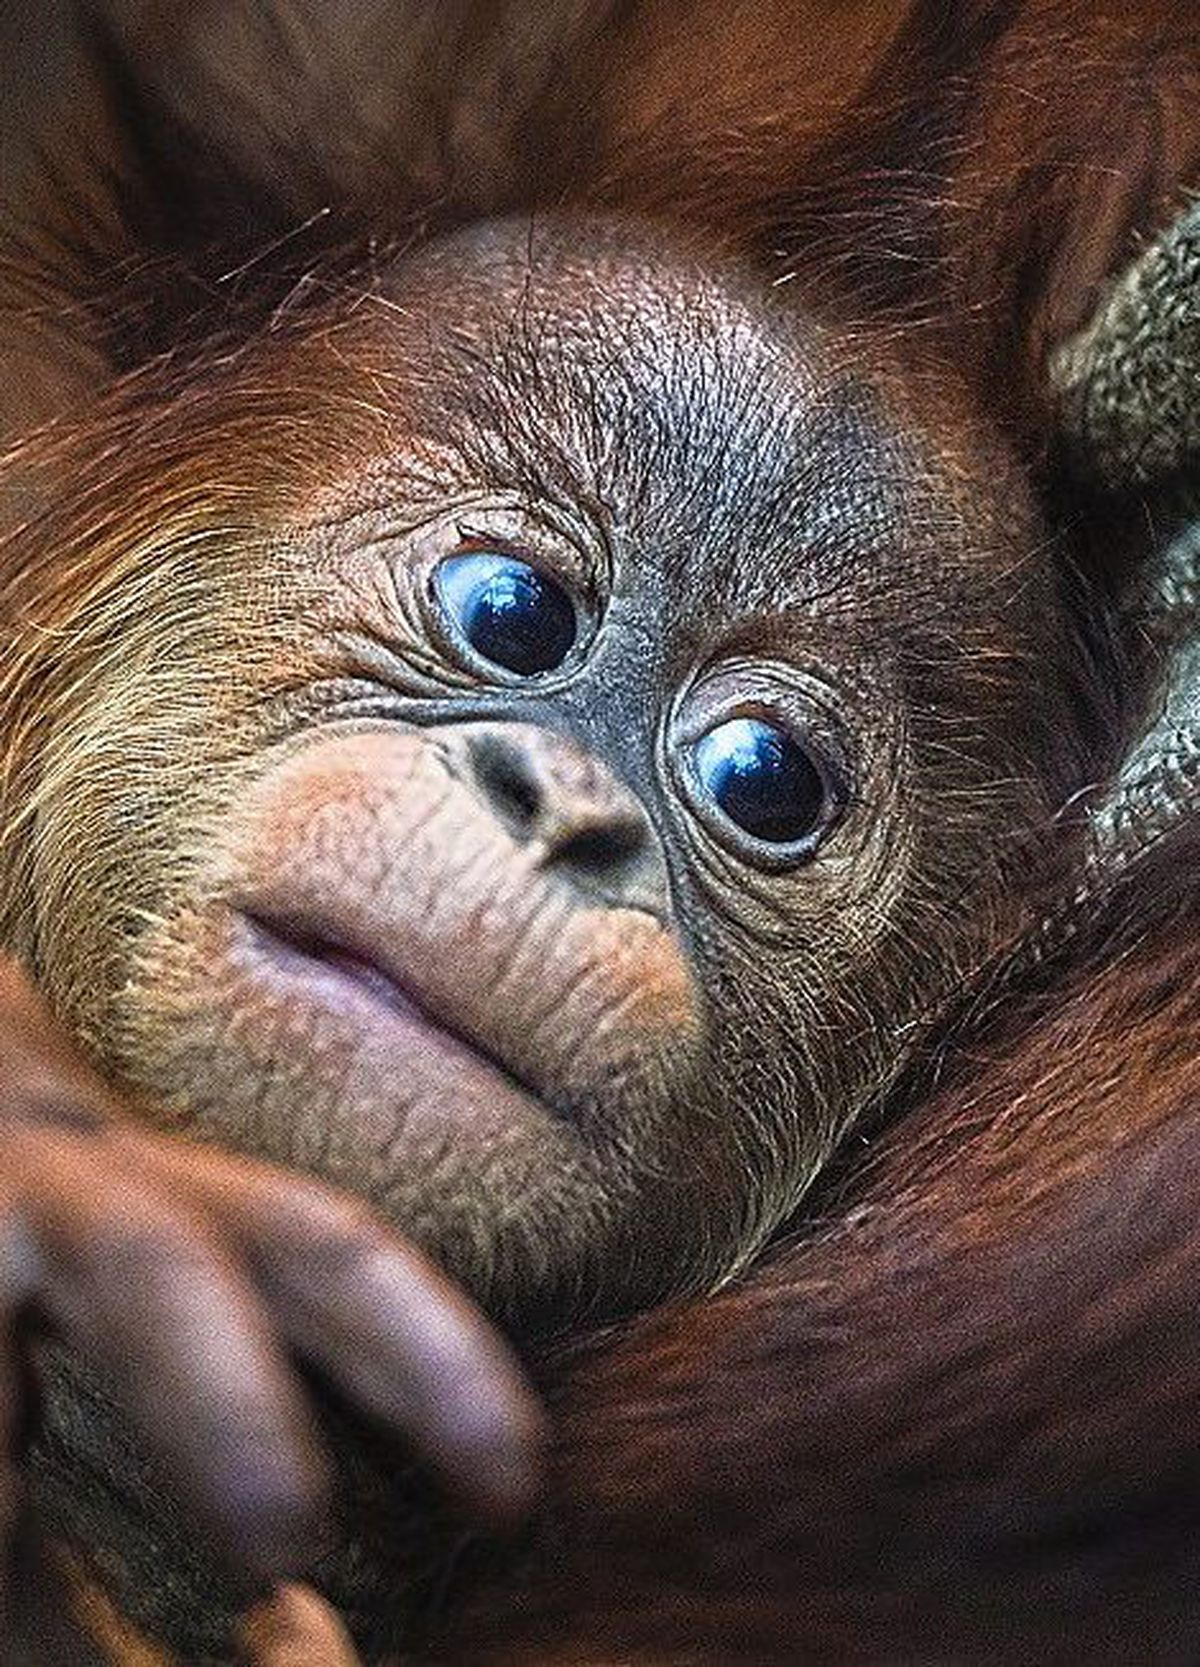 A Sumatran orangutan enjoys a quiet and cosy moment with mum at Chester Zoo